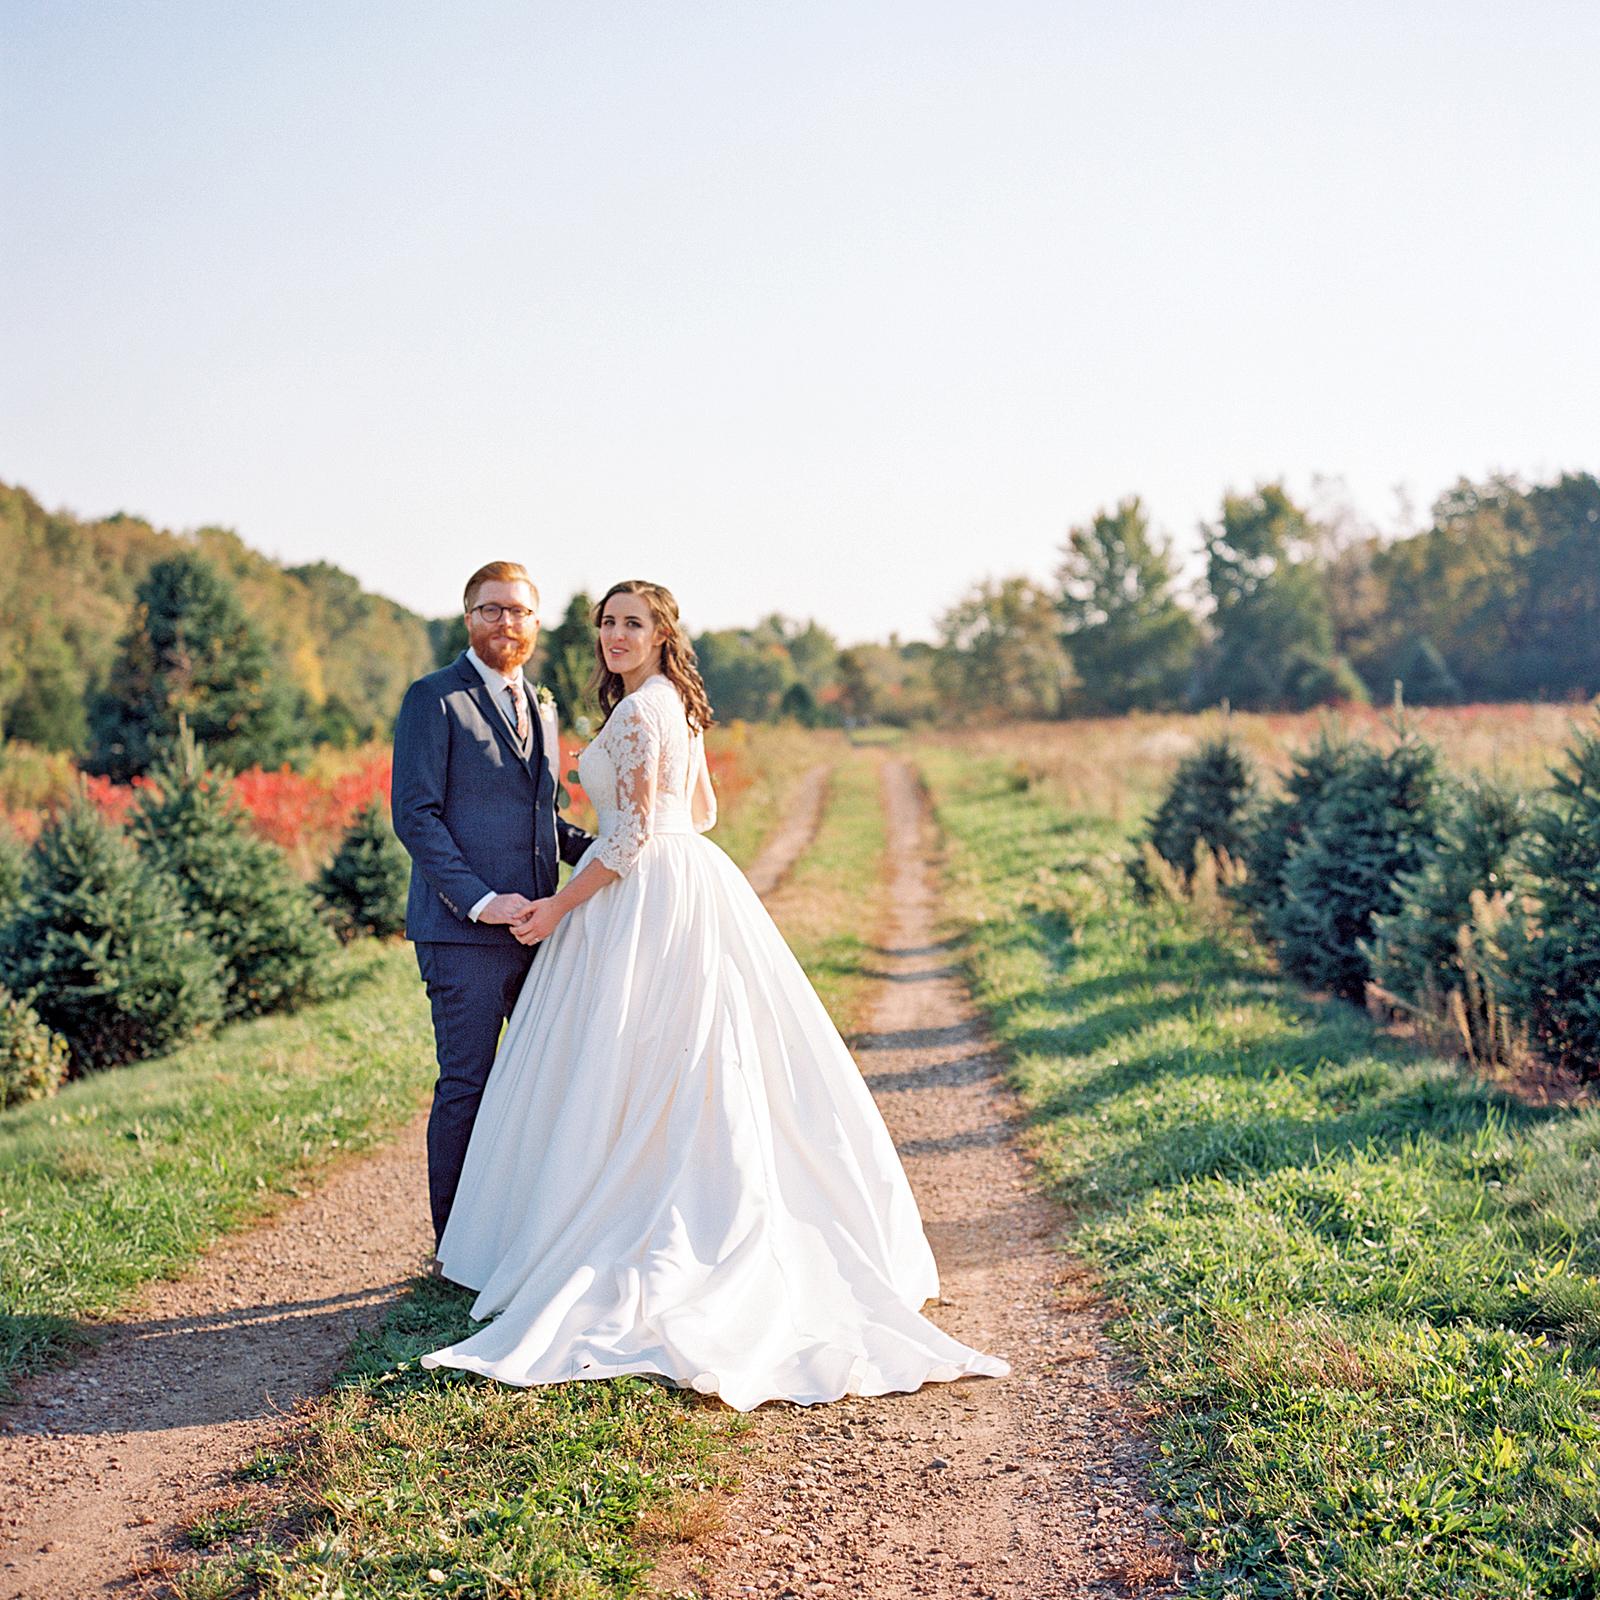 rachel elijah wedding couple pose